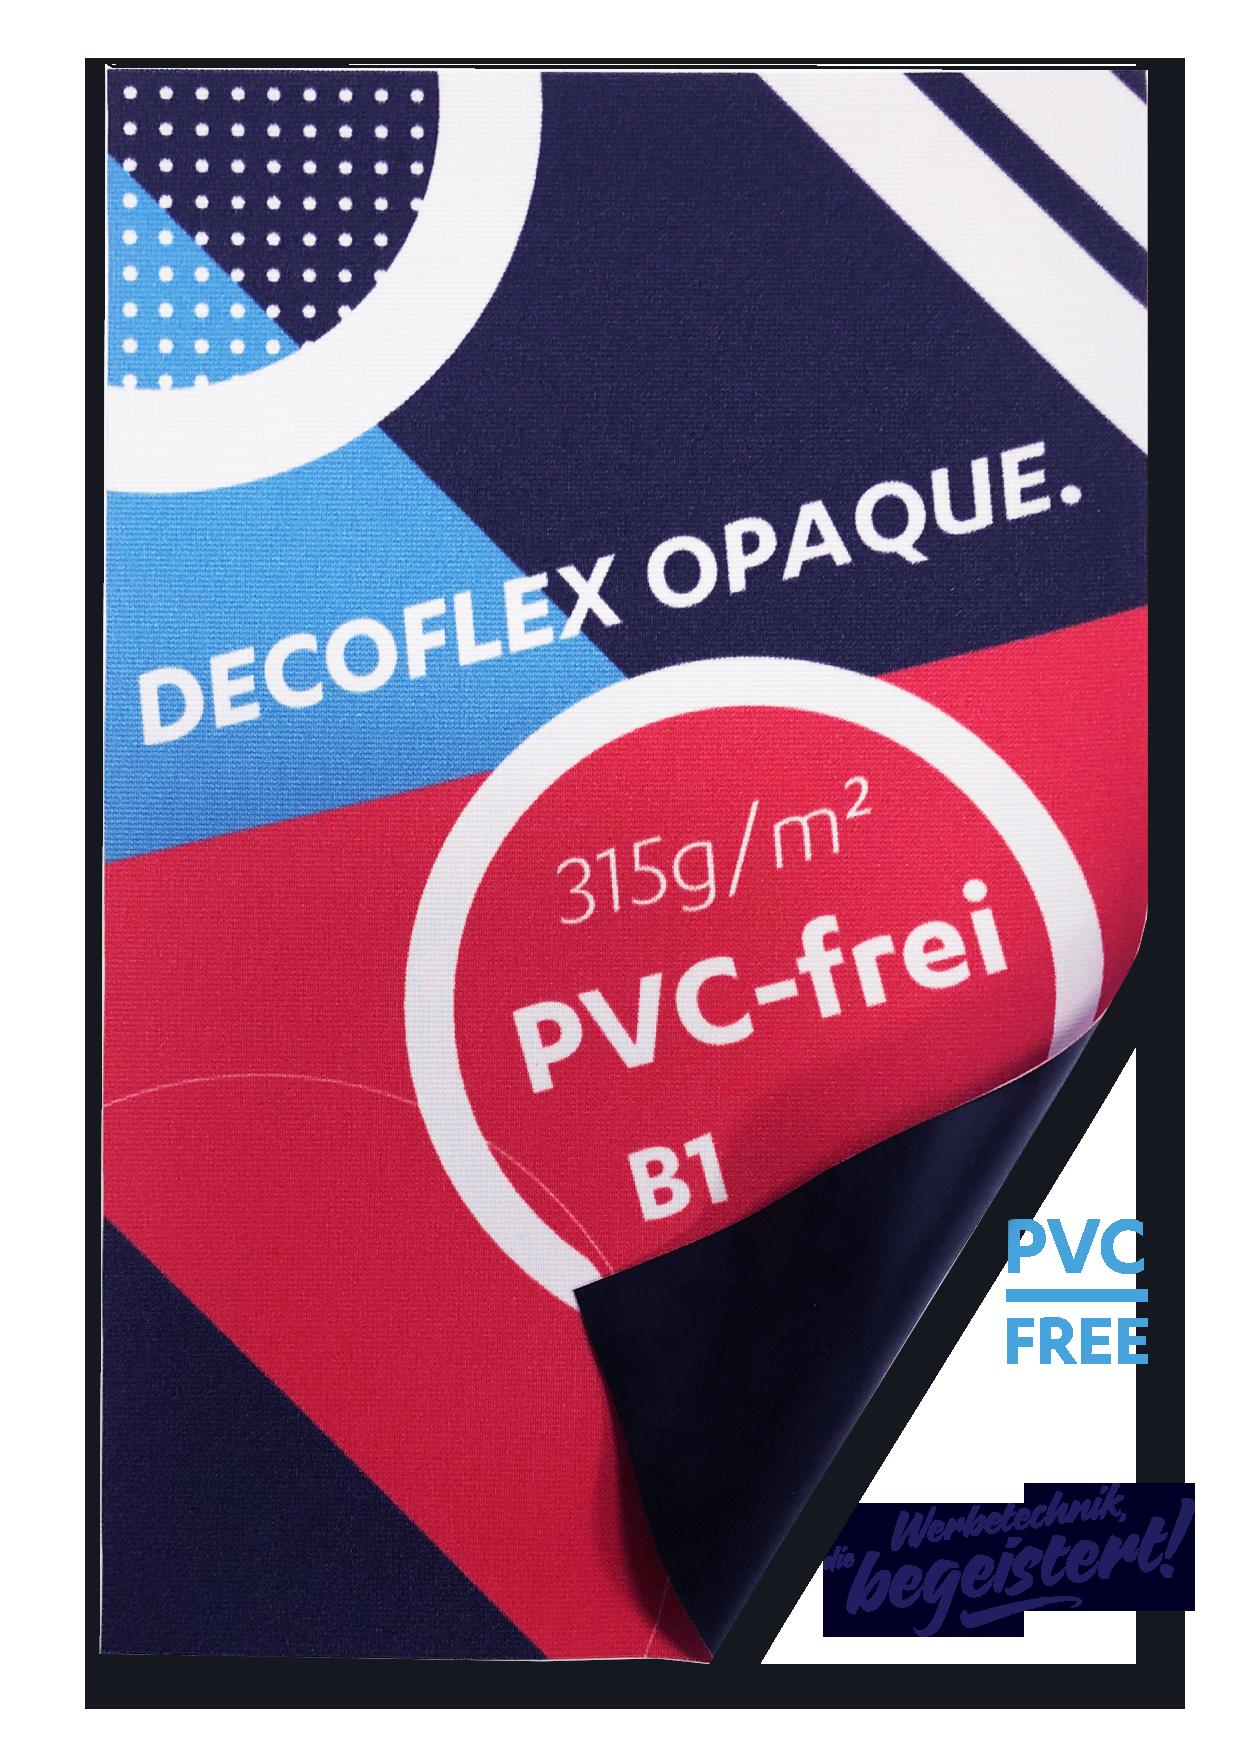 Decoflex-Opaque UV-Print blickdicht, B1, geschnitten Preis pro qm/ab 100 qm